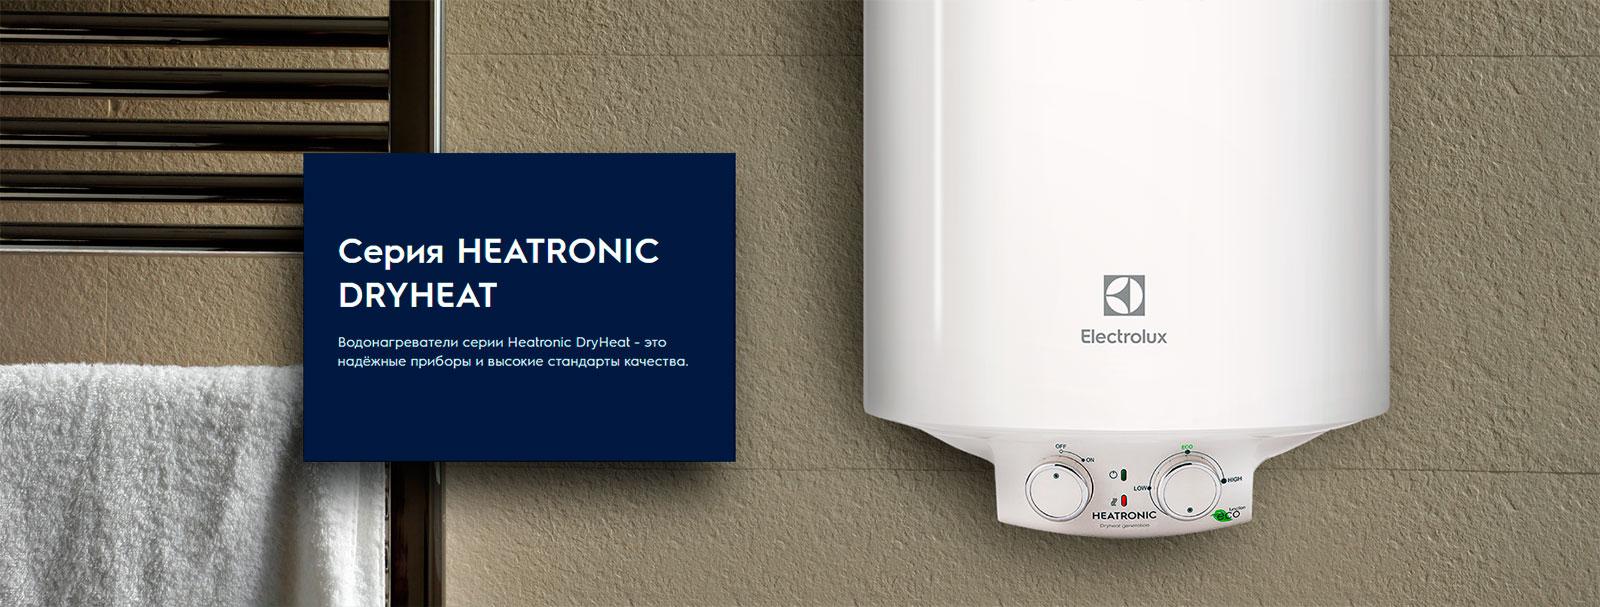 Electrolux EWH 100 Heatronic Slim DryHeat